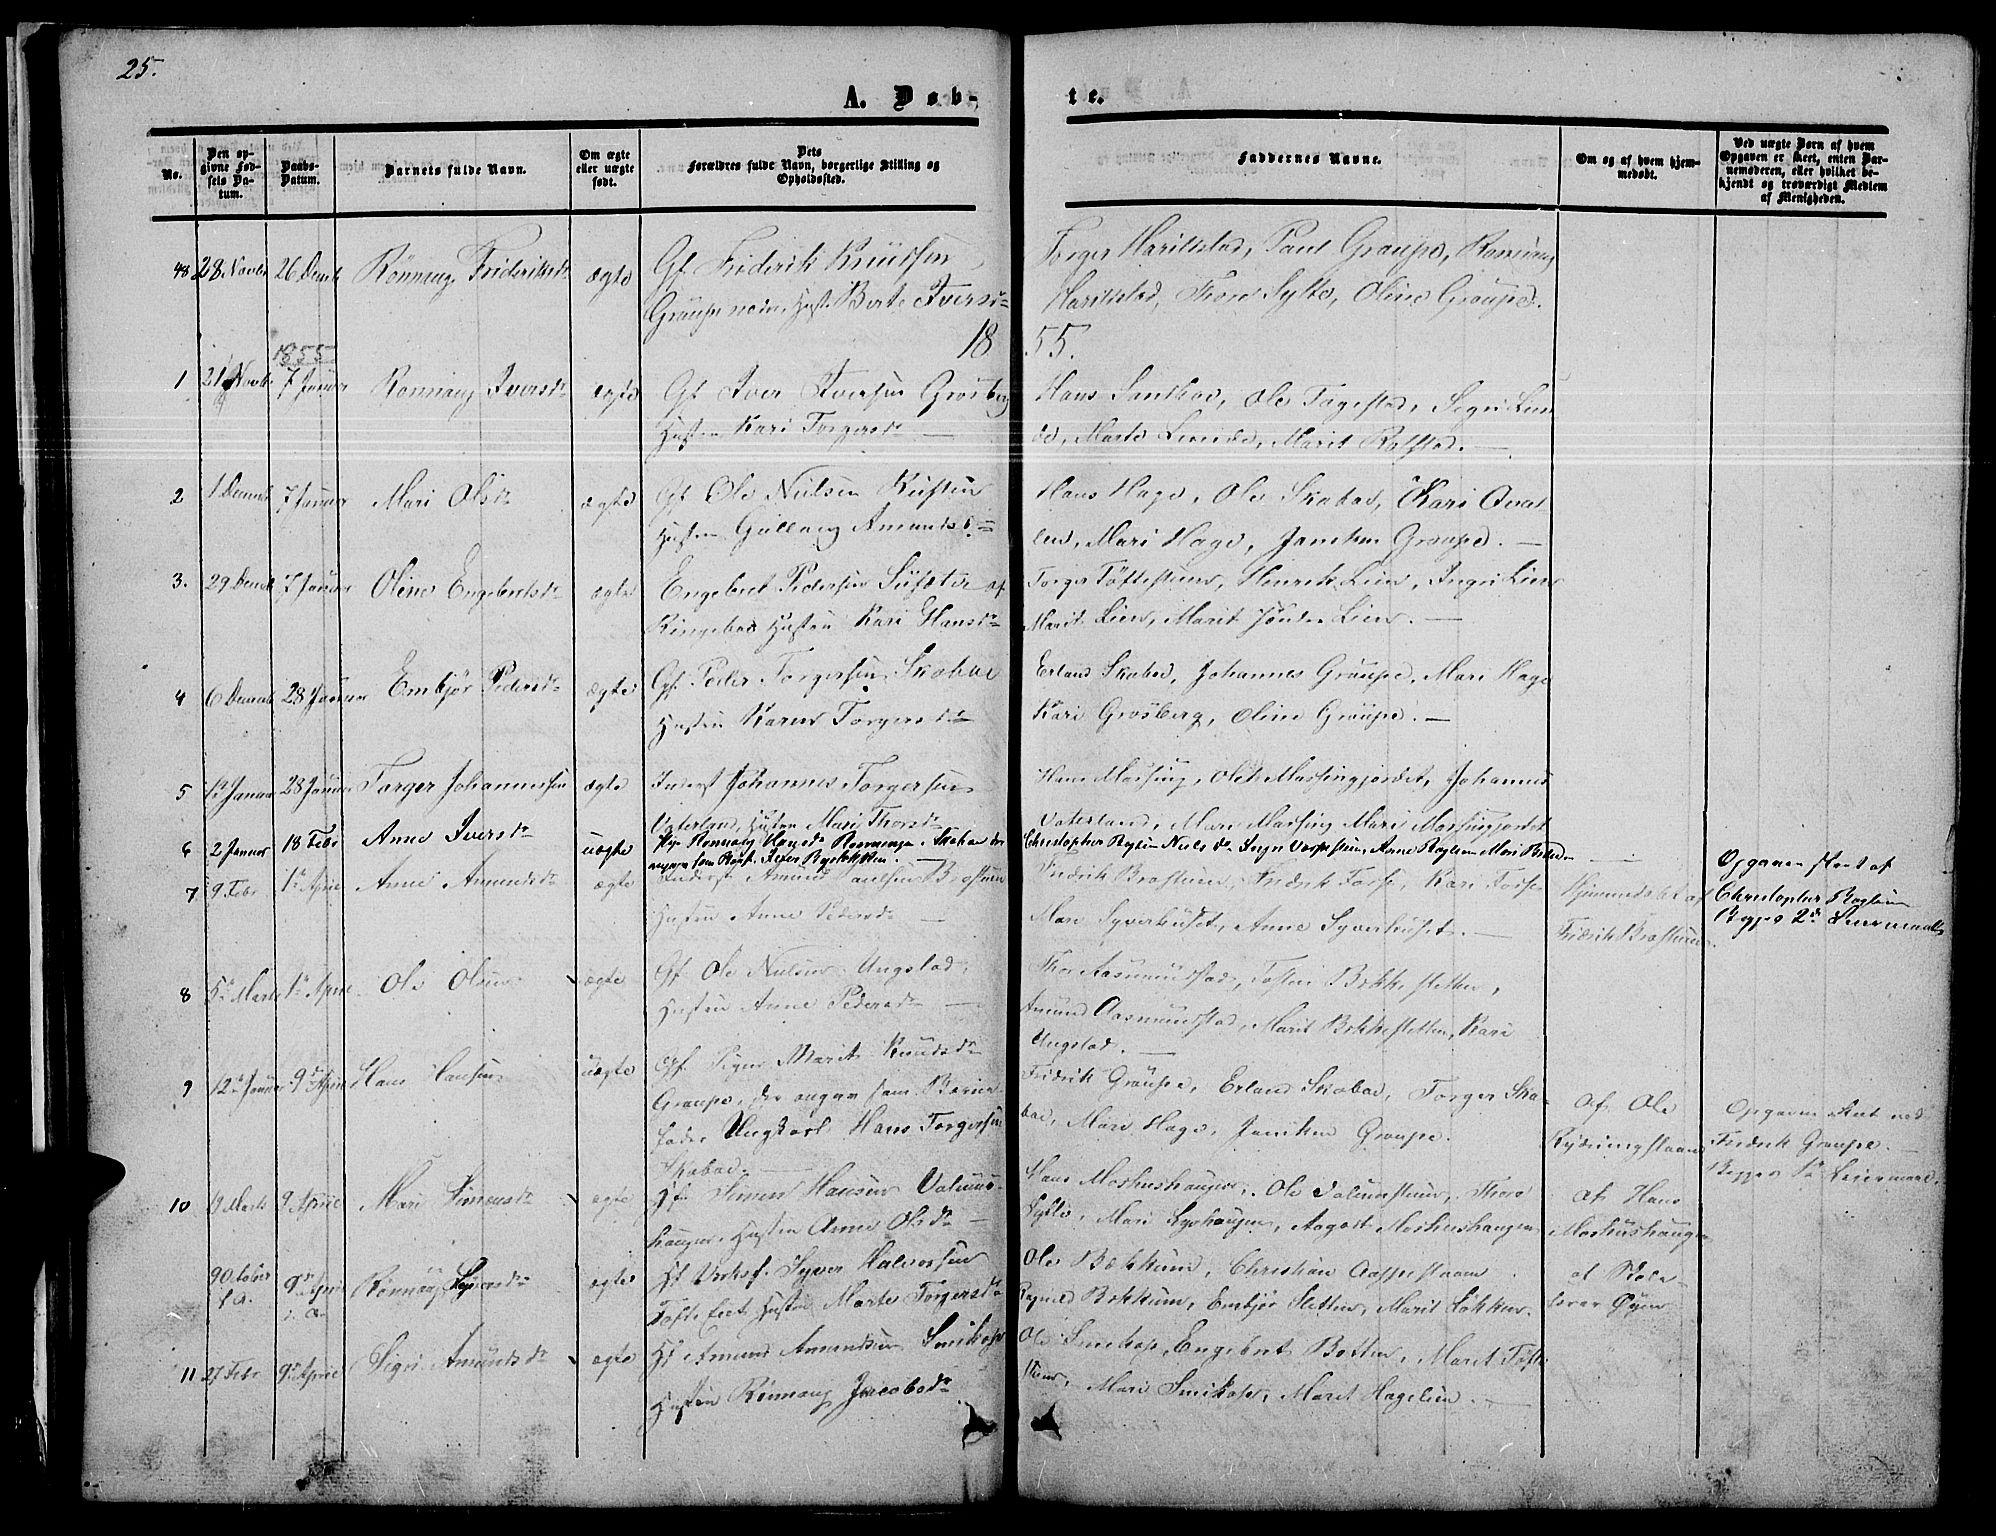 SAH, Nord-Fron prestekontor, Klokkerbok nr. 2, 1851-1883, s. 25